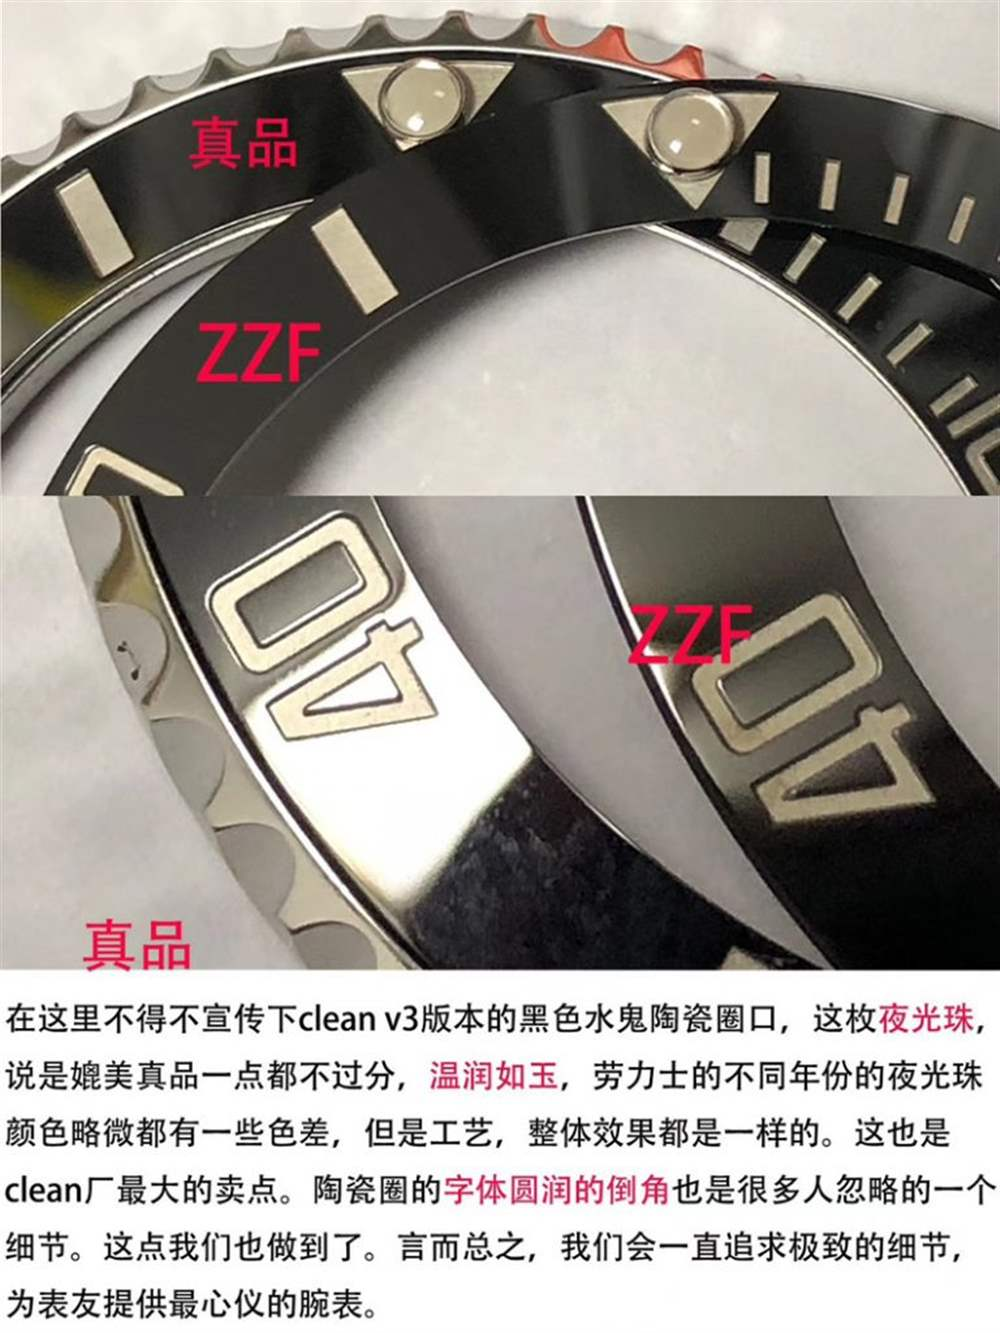 ZZ厂劳力士无日历水鬼复刻表「3130机芯」ZZ厂无日历水鬼做工怎么样